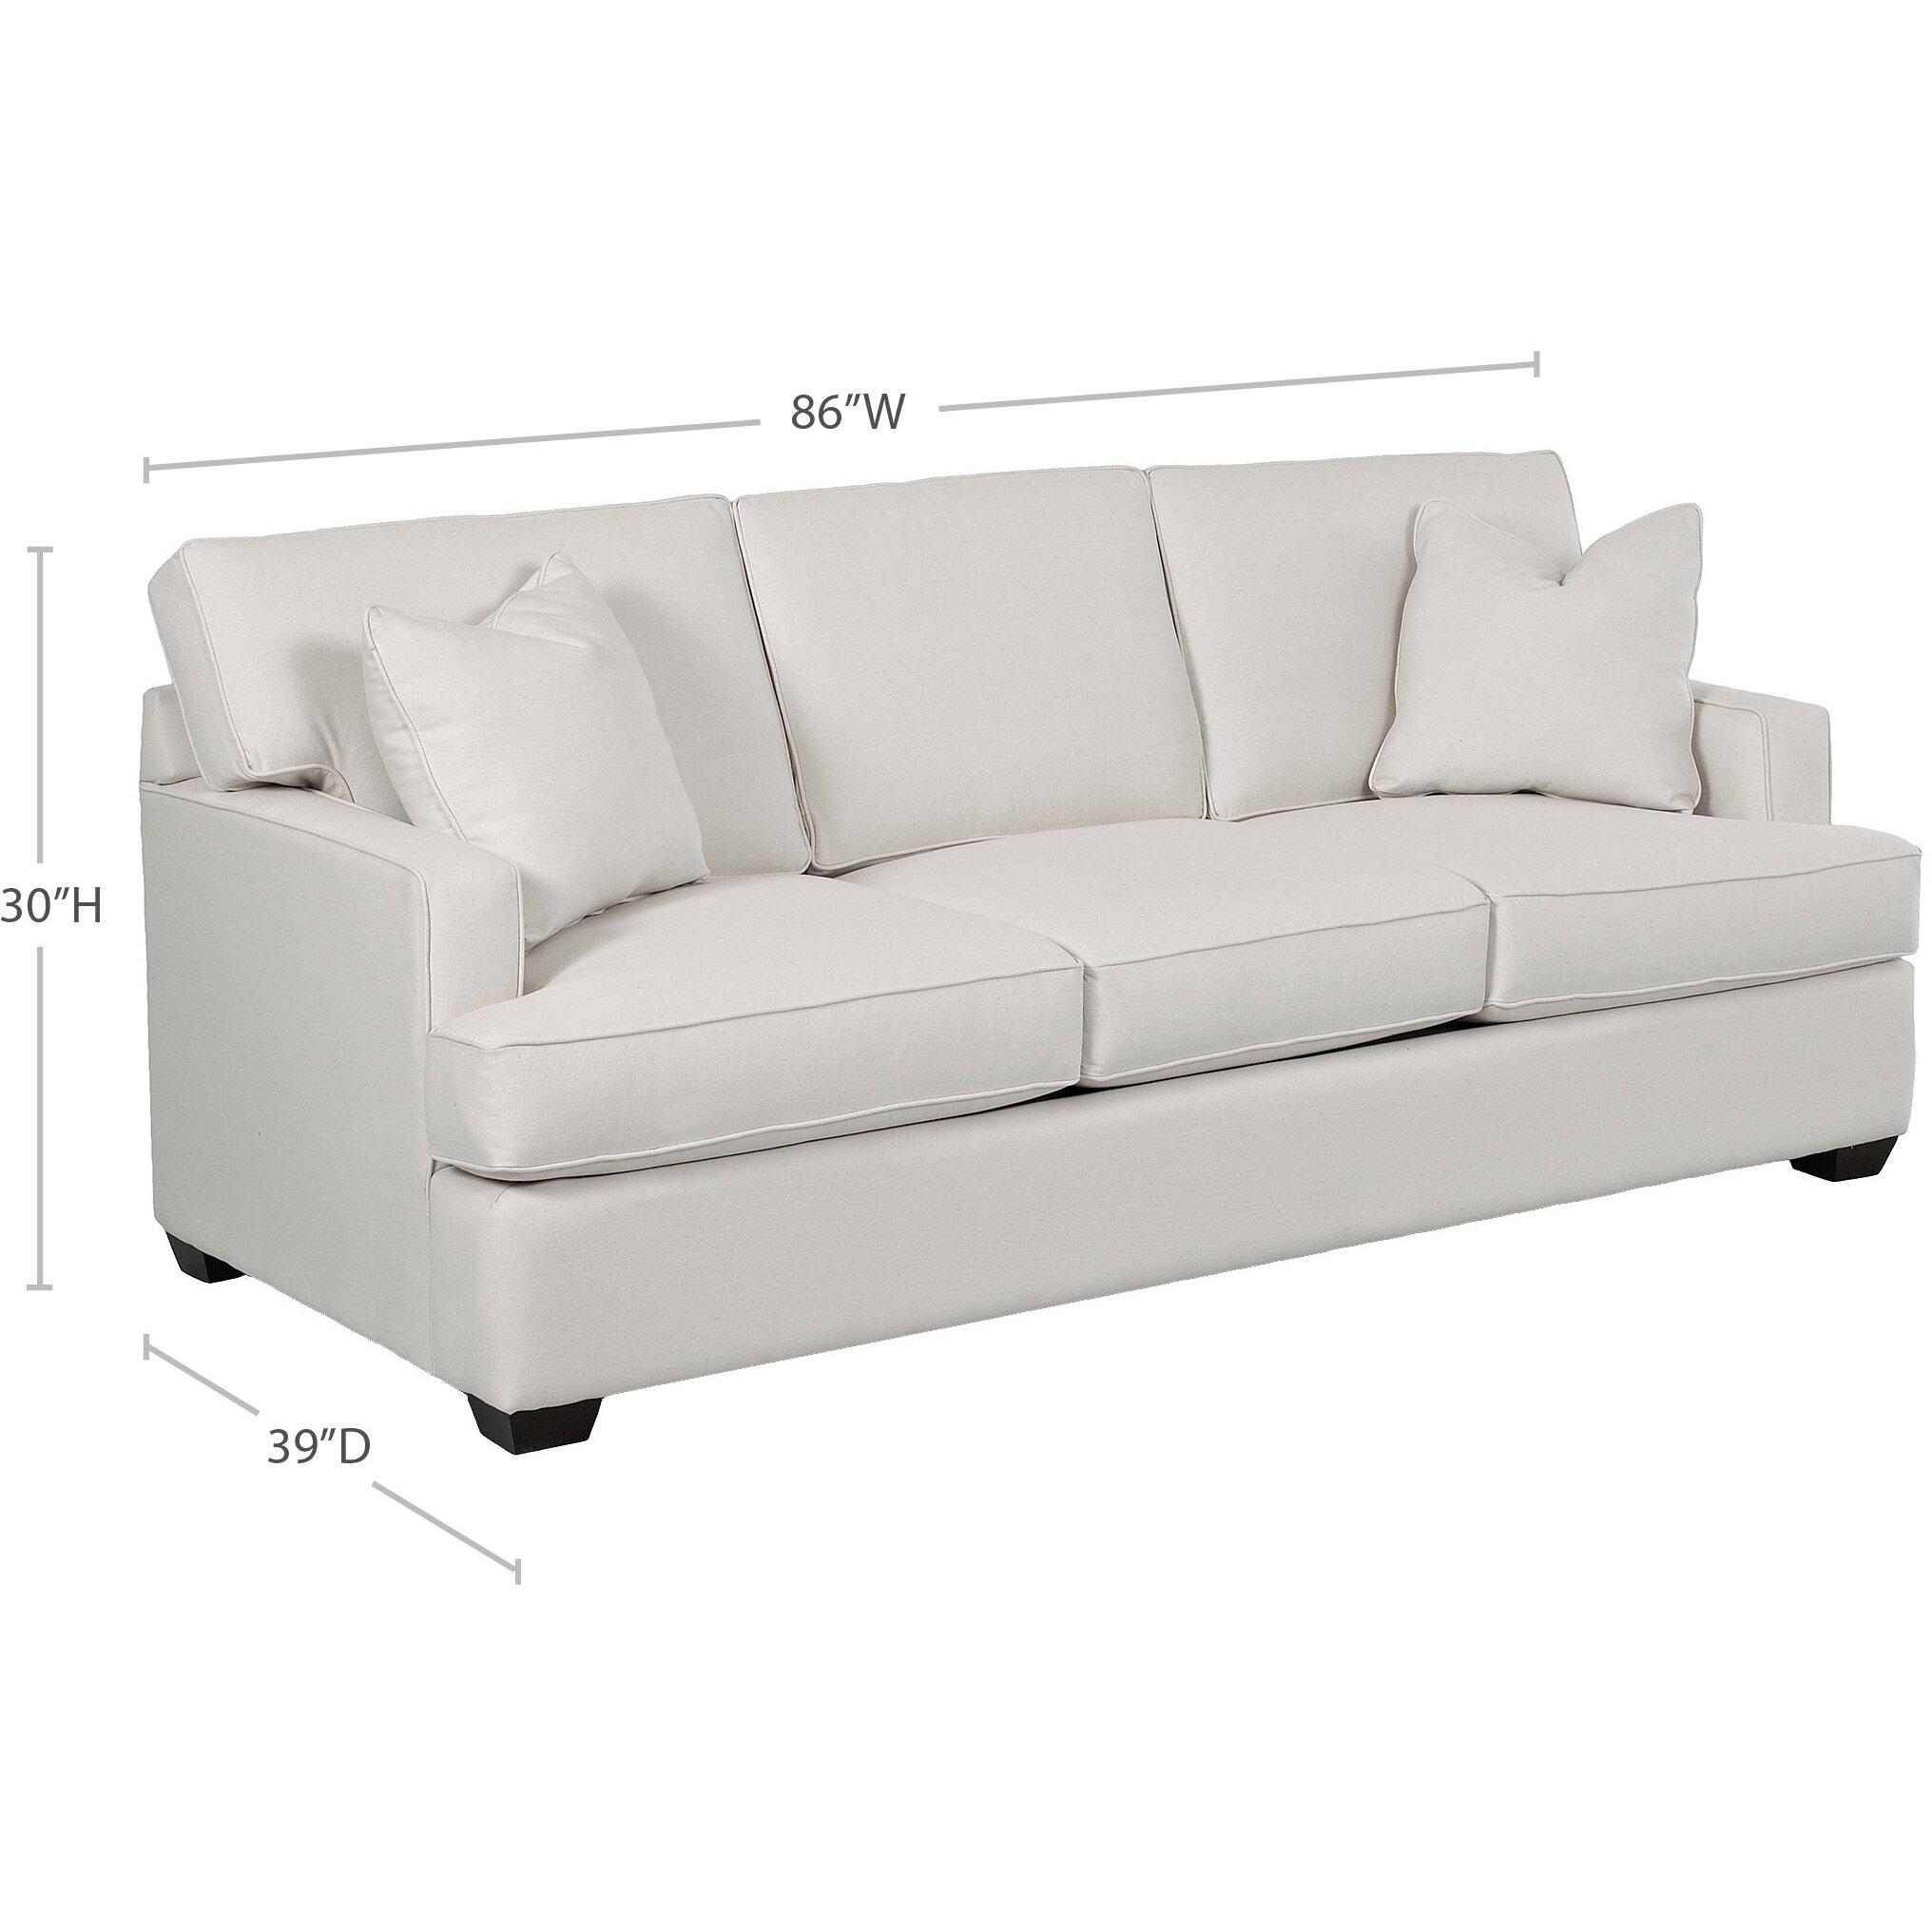 Wayfair Custom Upholstery Avery Sofa Reviews